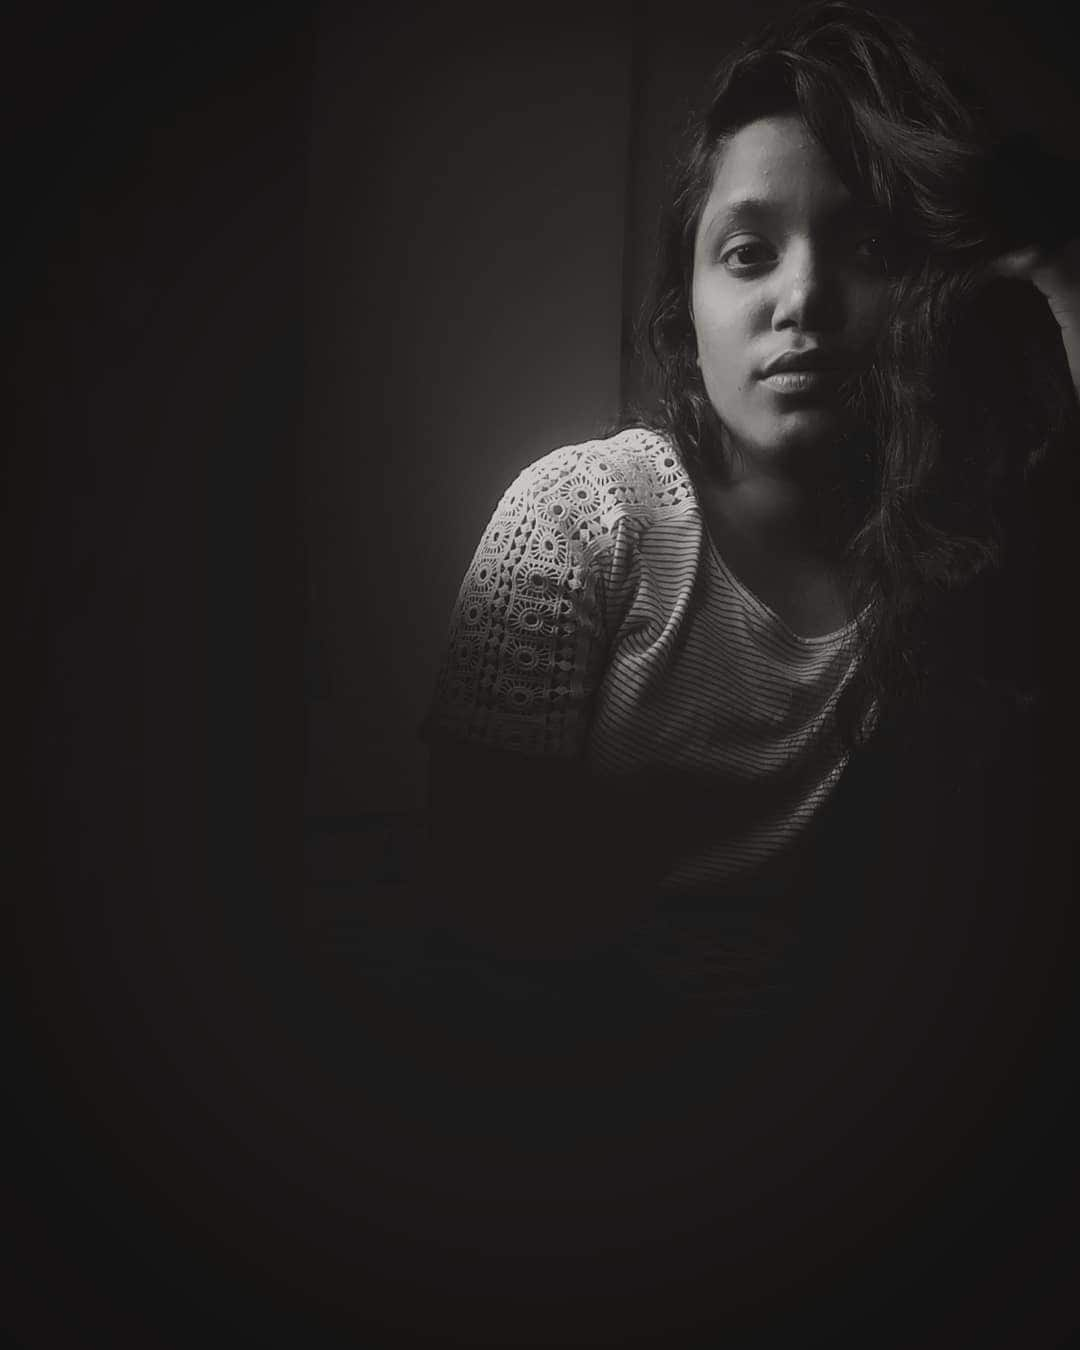 #roposo #pose #blackandwhitephotography #behappy #beyou #roposo-good #click